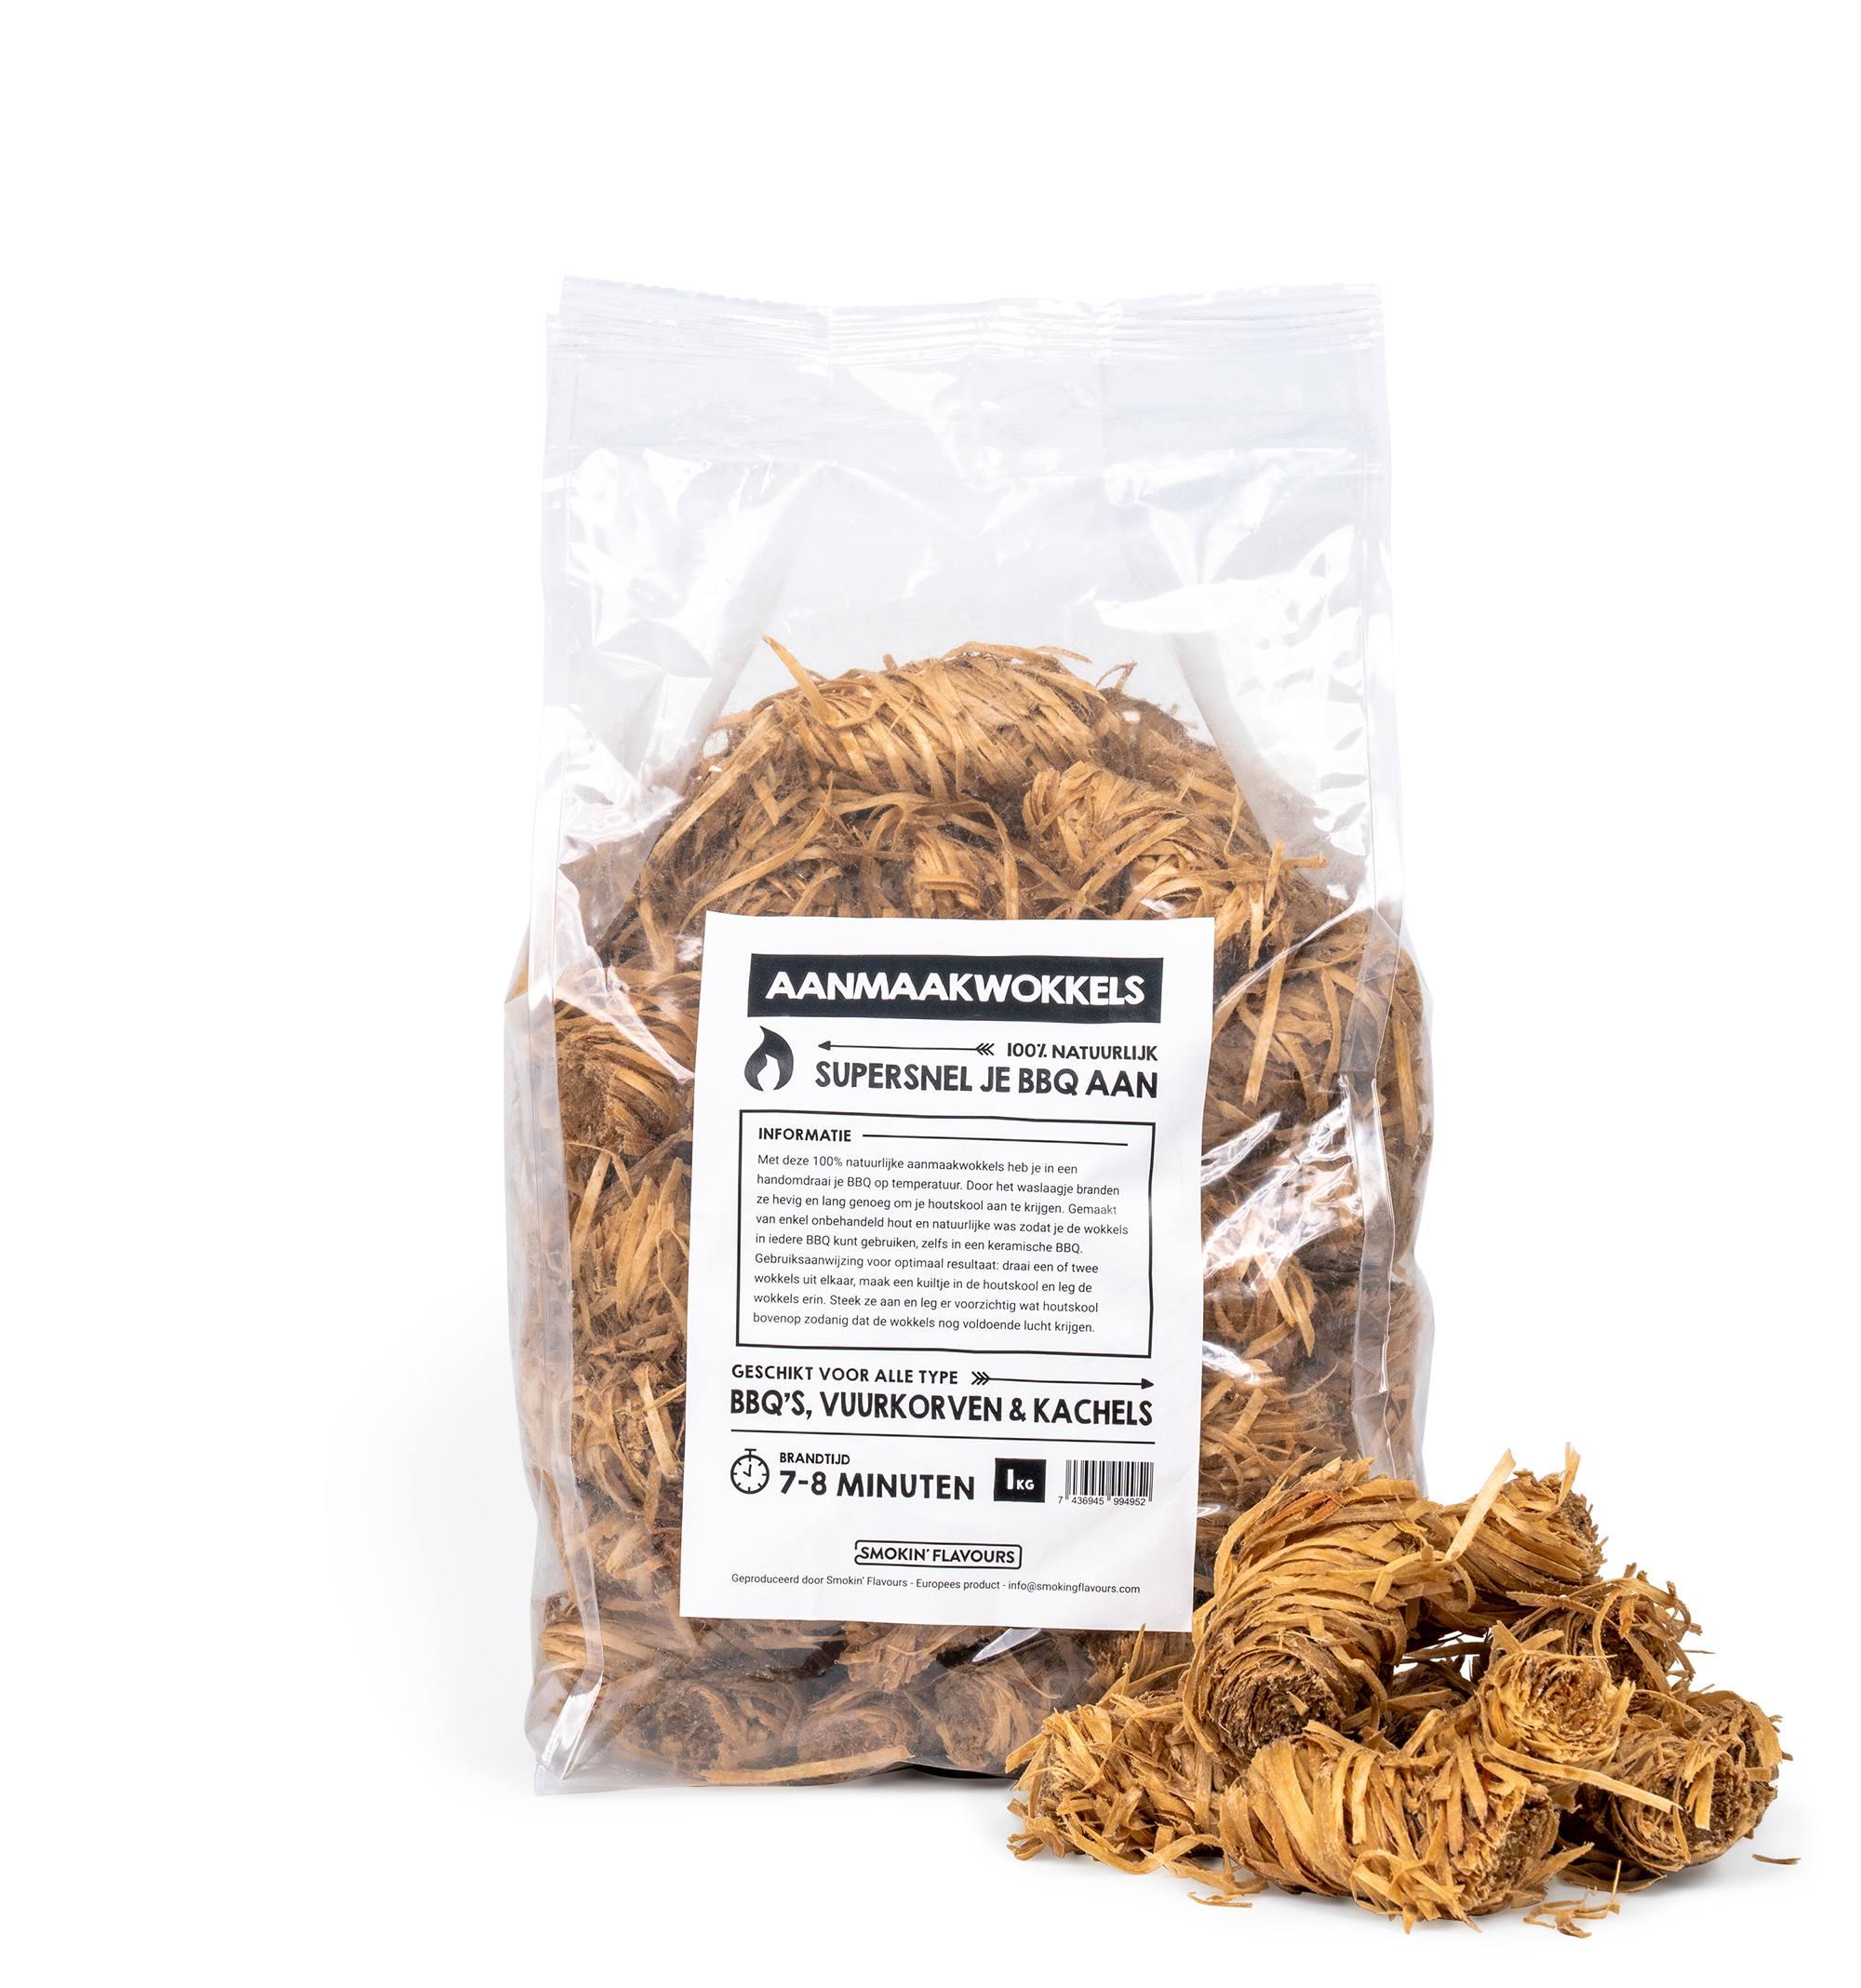 Smoking-Flavours-aanmaakwokkels-pose-1